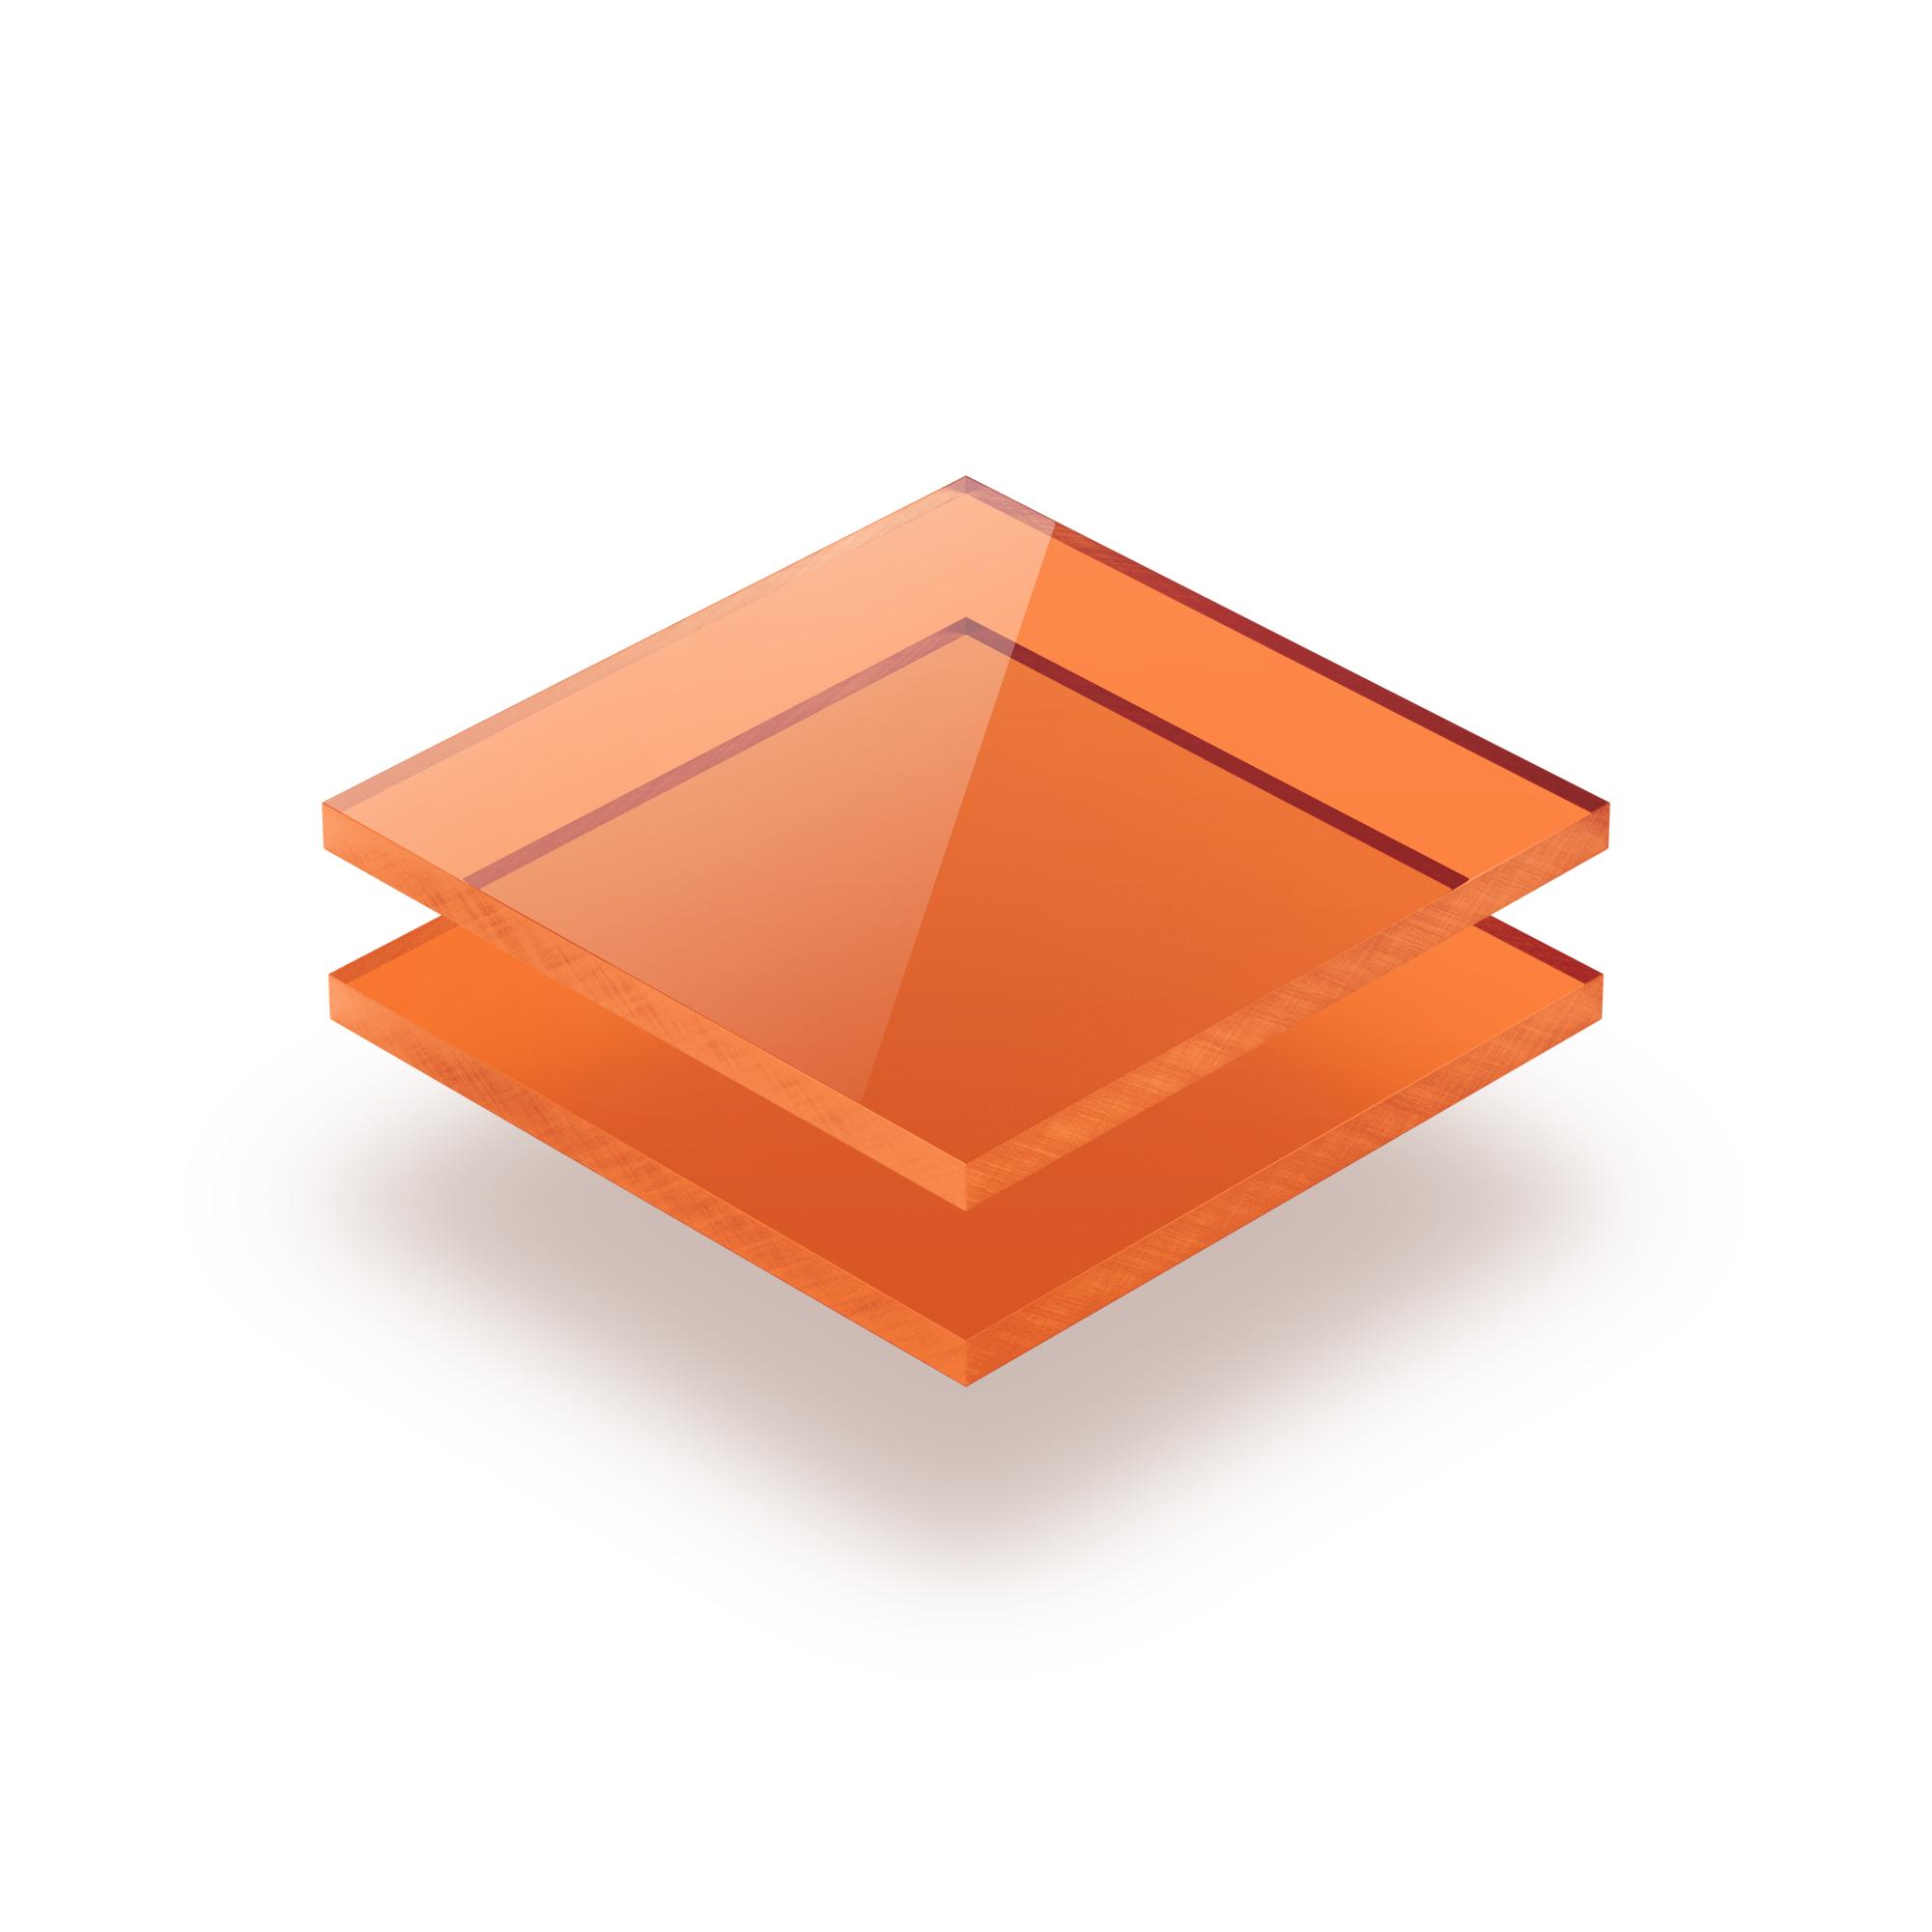 plexiglas oranje 3 mm gratis op maat gezaagd. Black Bedroom Furniture Sets. Home Design Ideas